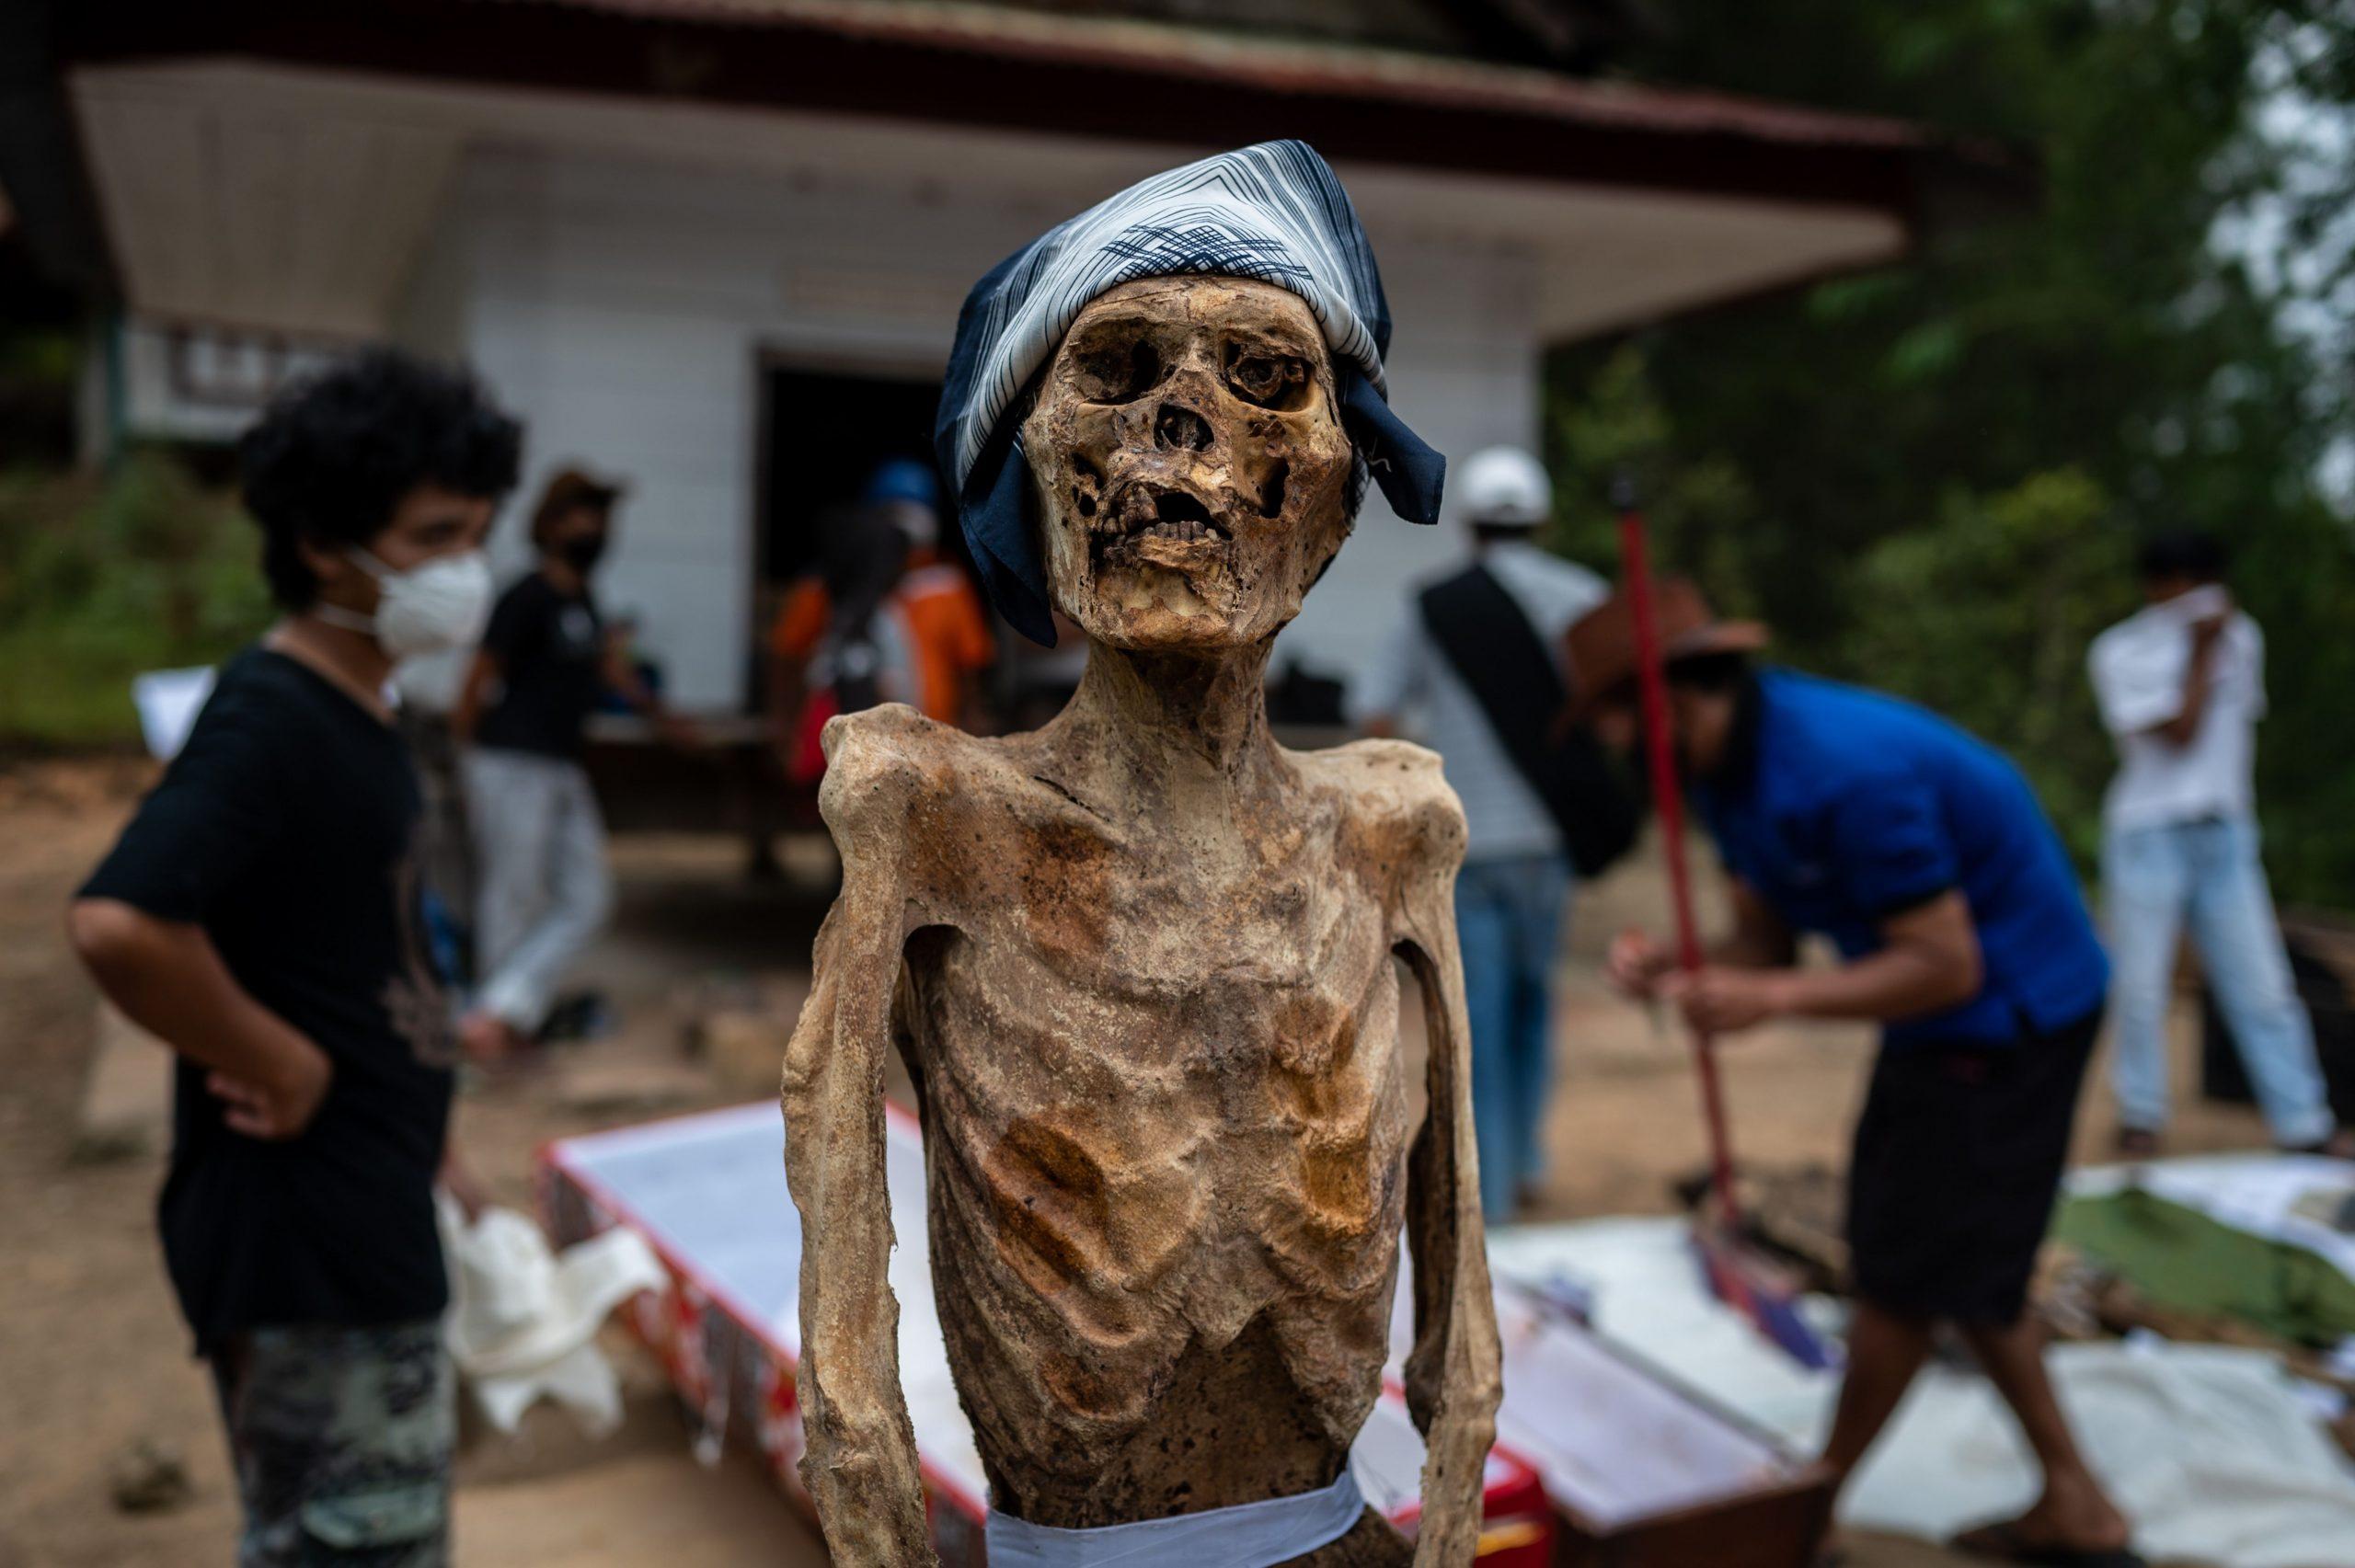 Manene Death Ritual In Indonesia, Nort Toraja, South sulawesi - 25 Aug 2020  - Pothead Media